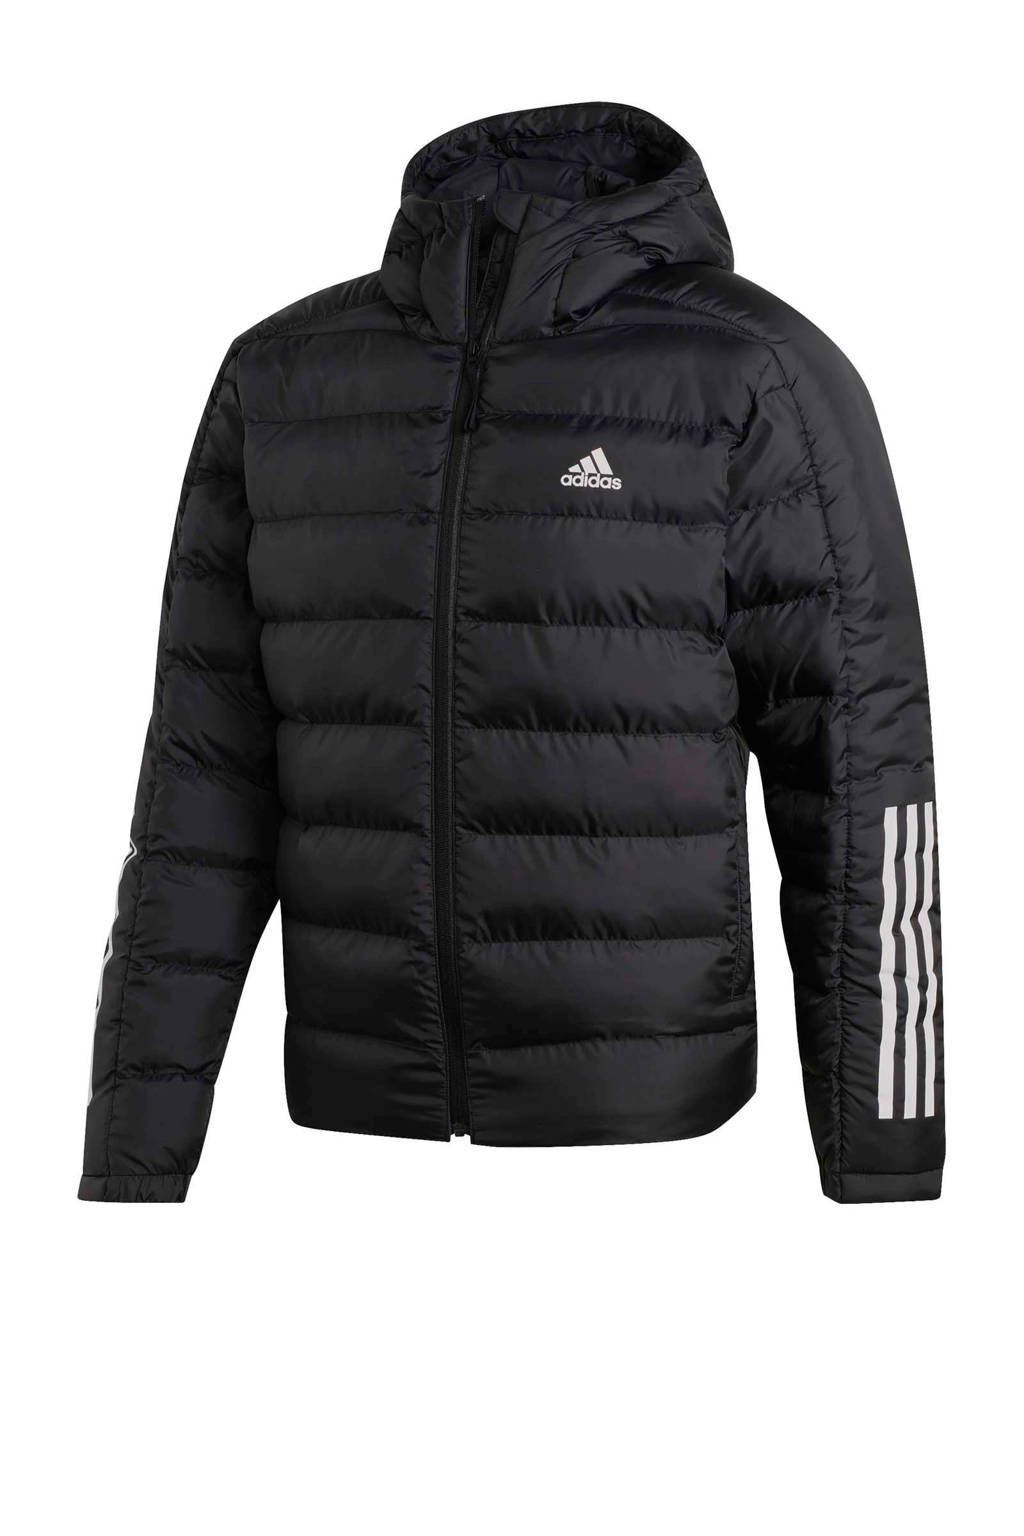 adidas Performance jack zwart, Zwart/wit